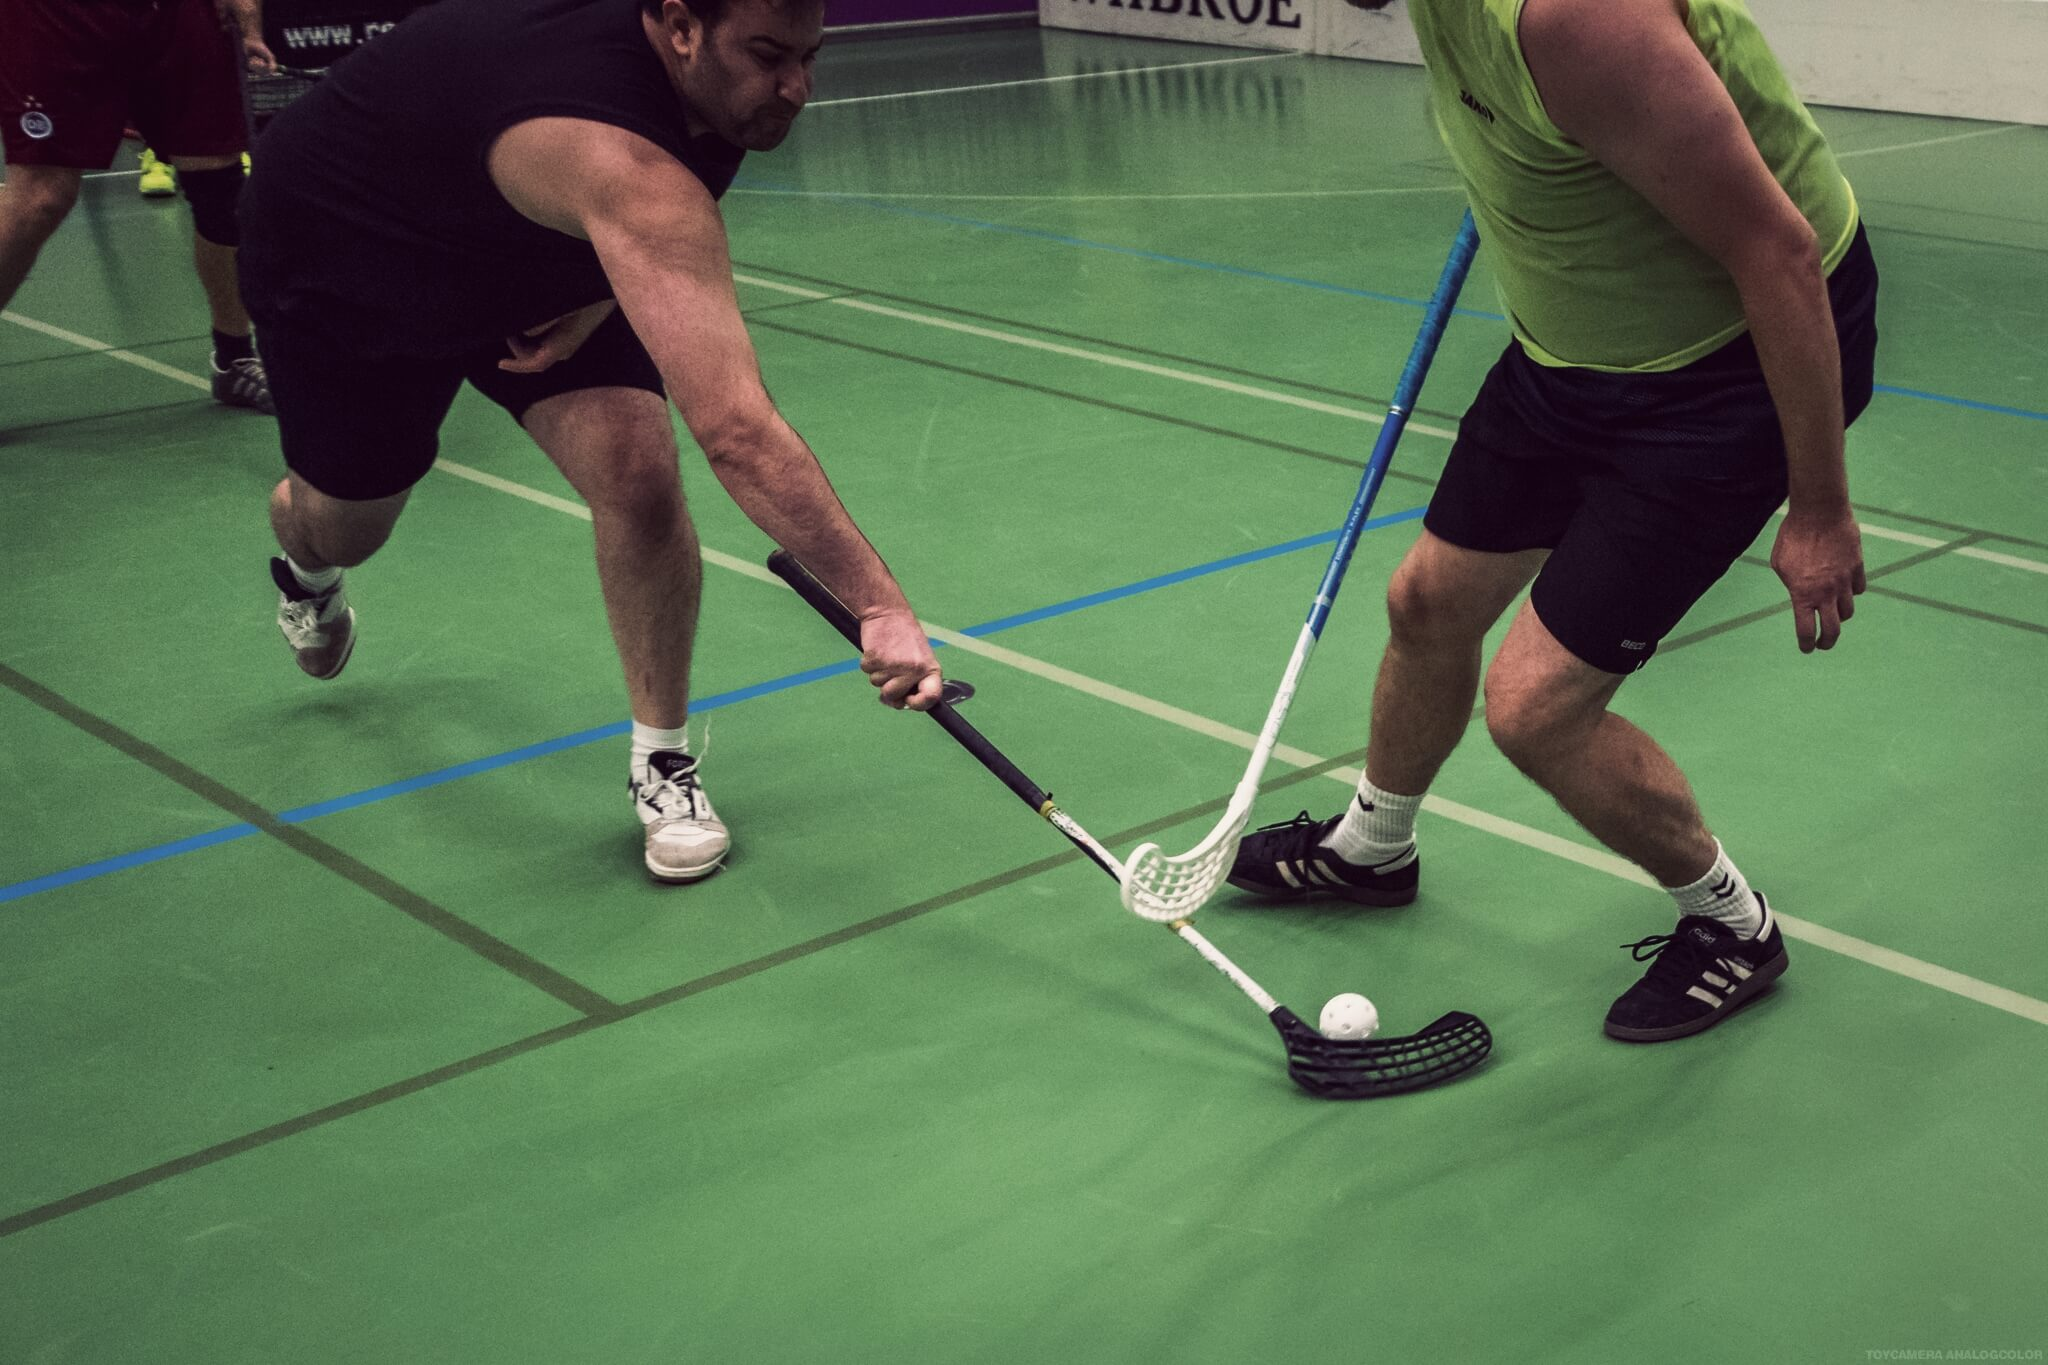 IPC - Folk High School Sport at International People's College in Denmark8